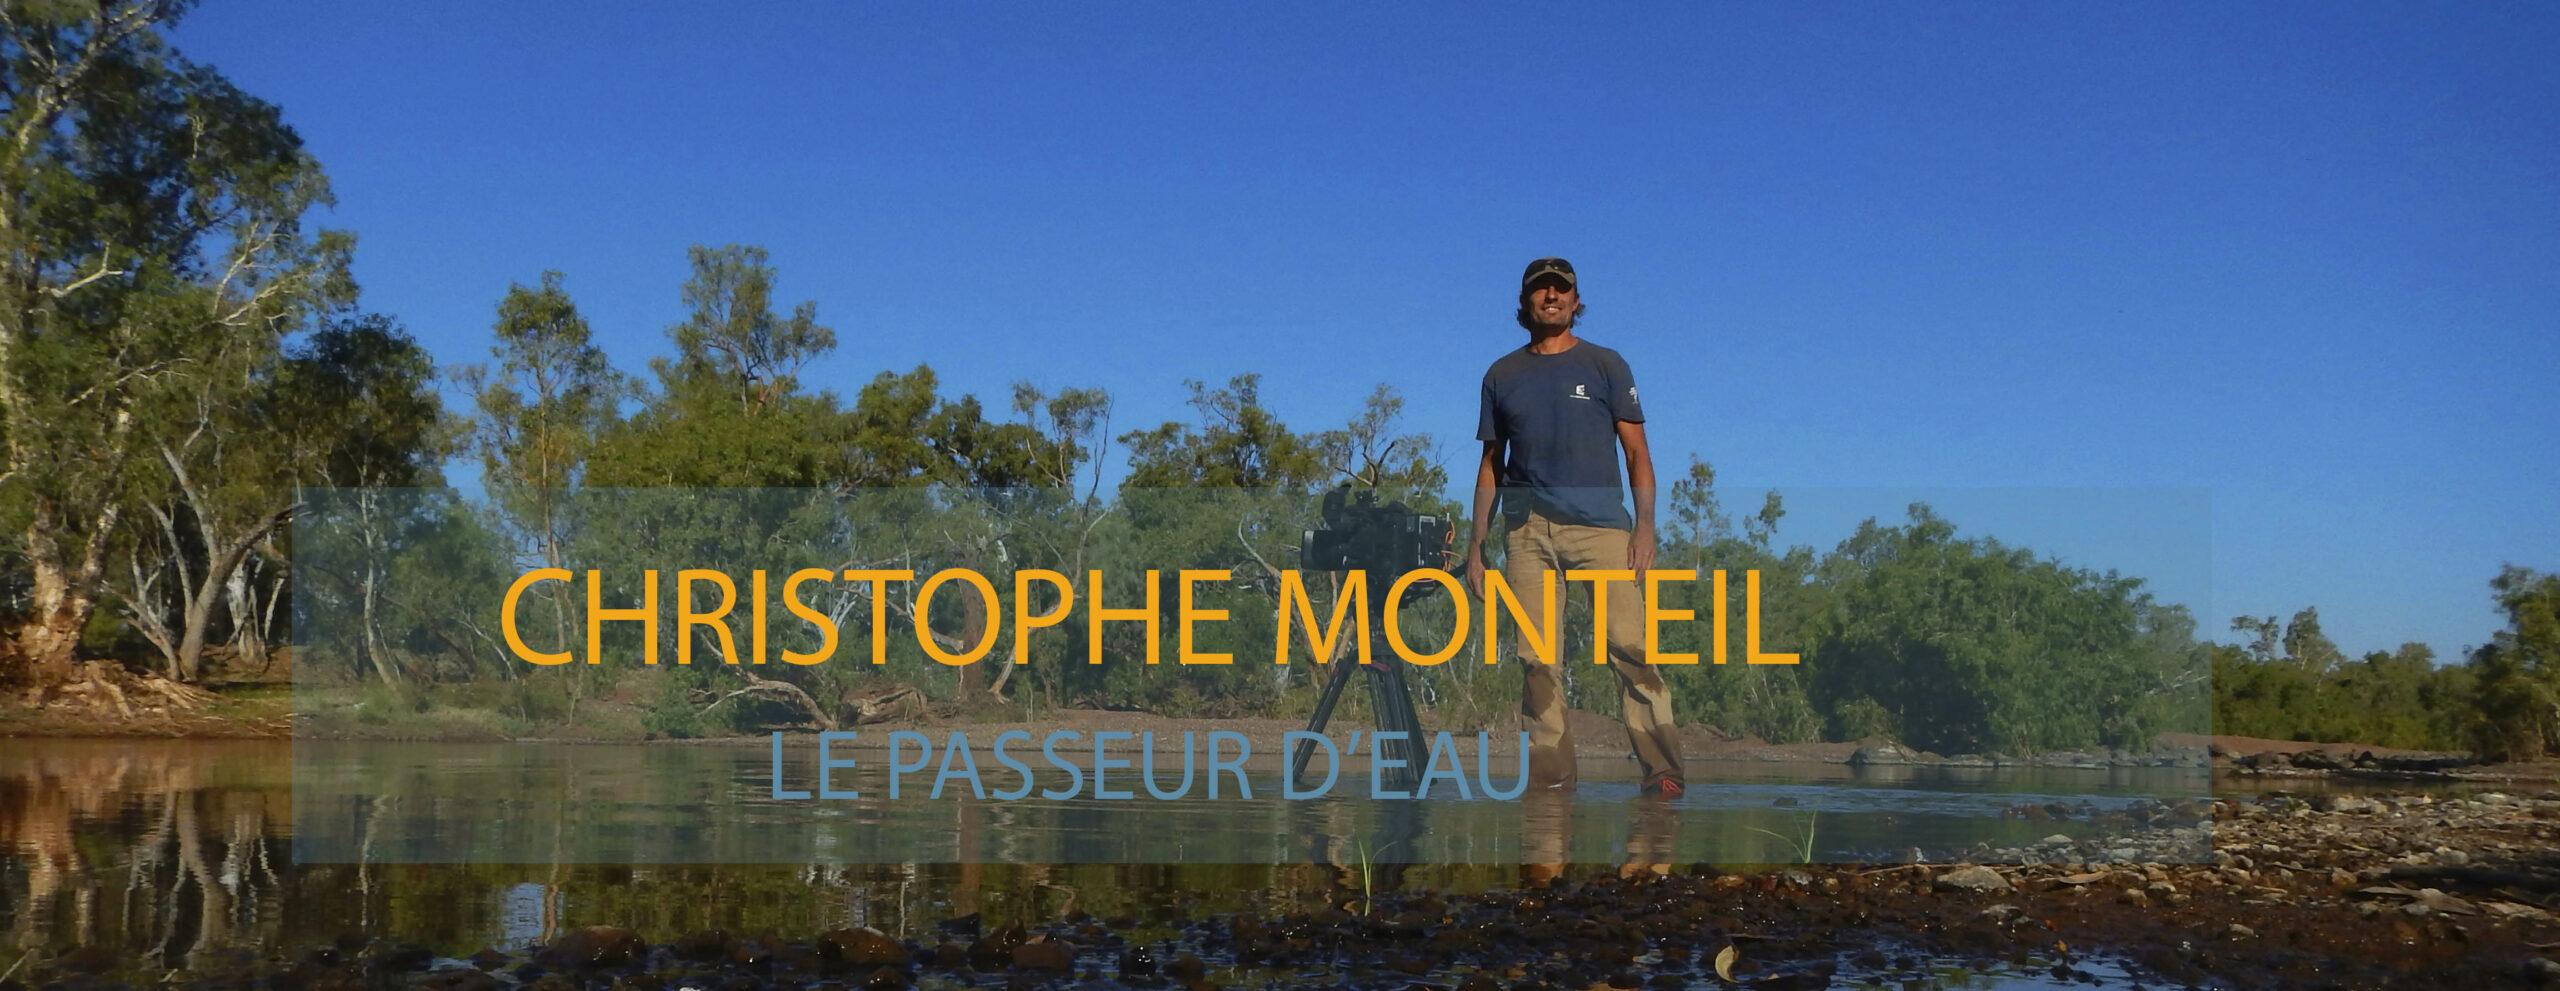 Christophe Monteil Australie_Art4Nature